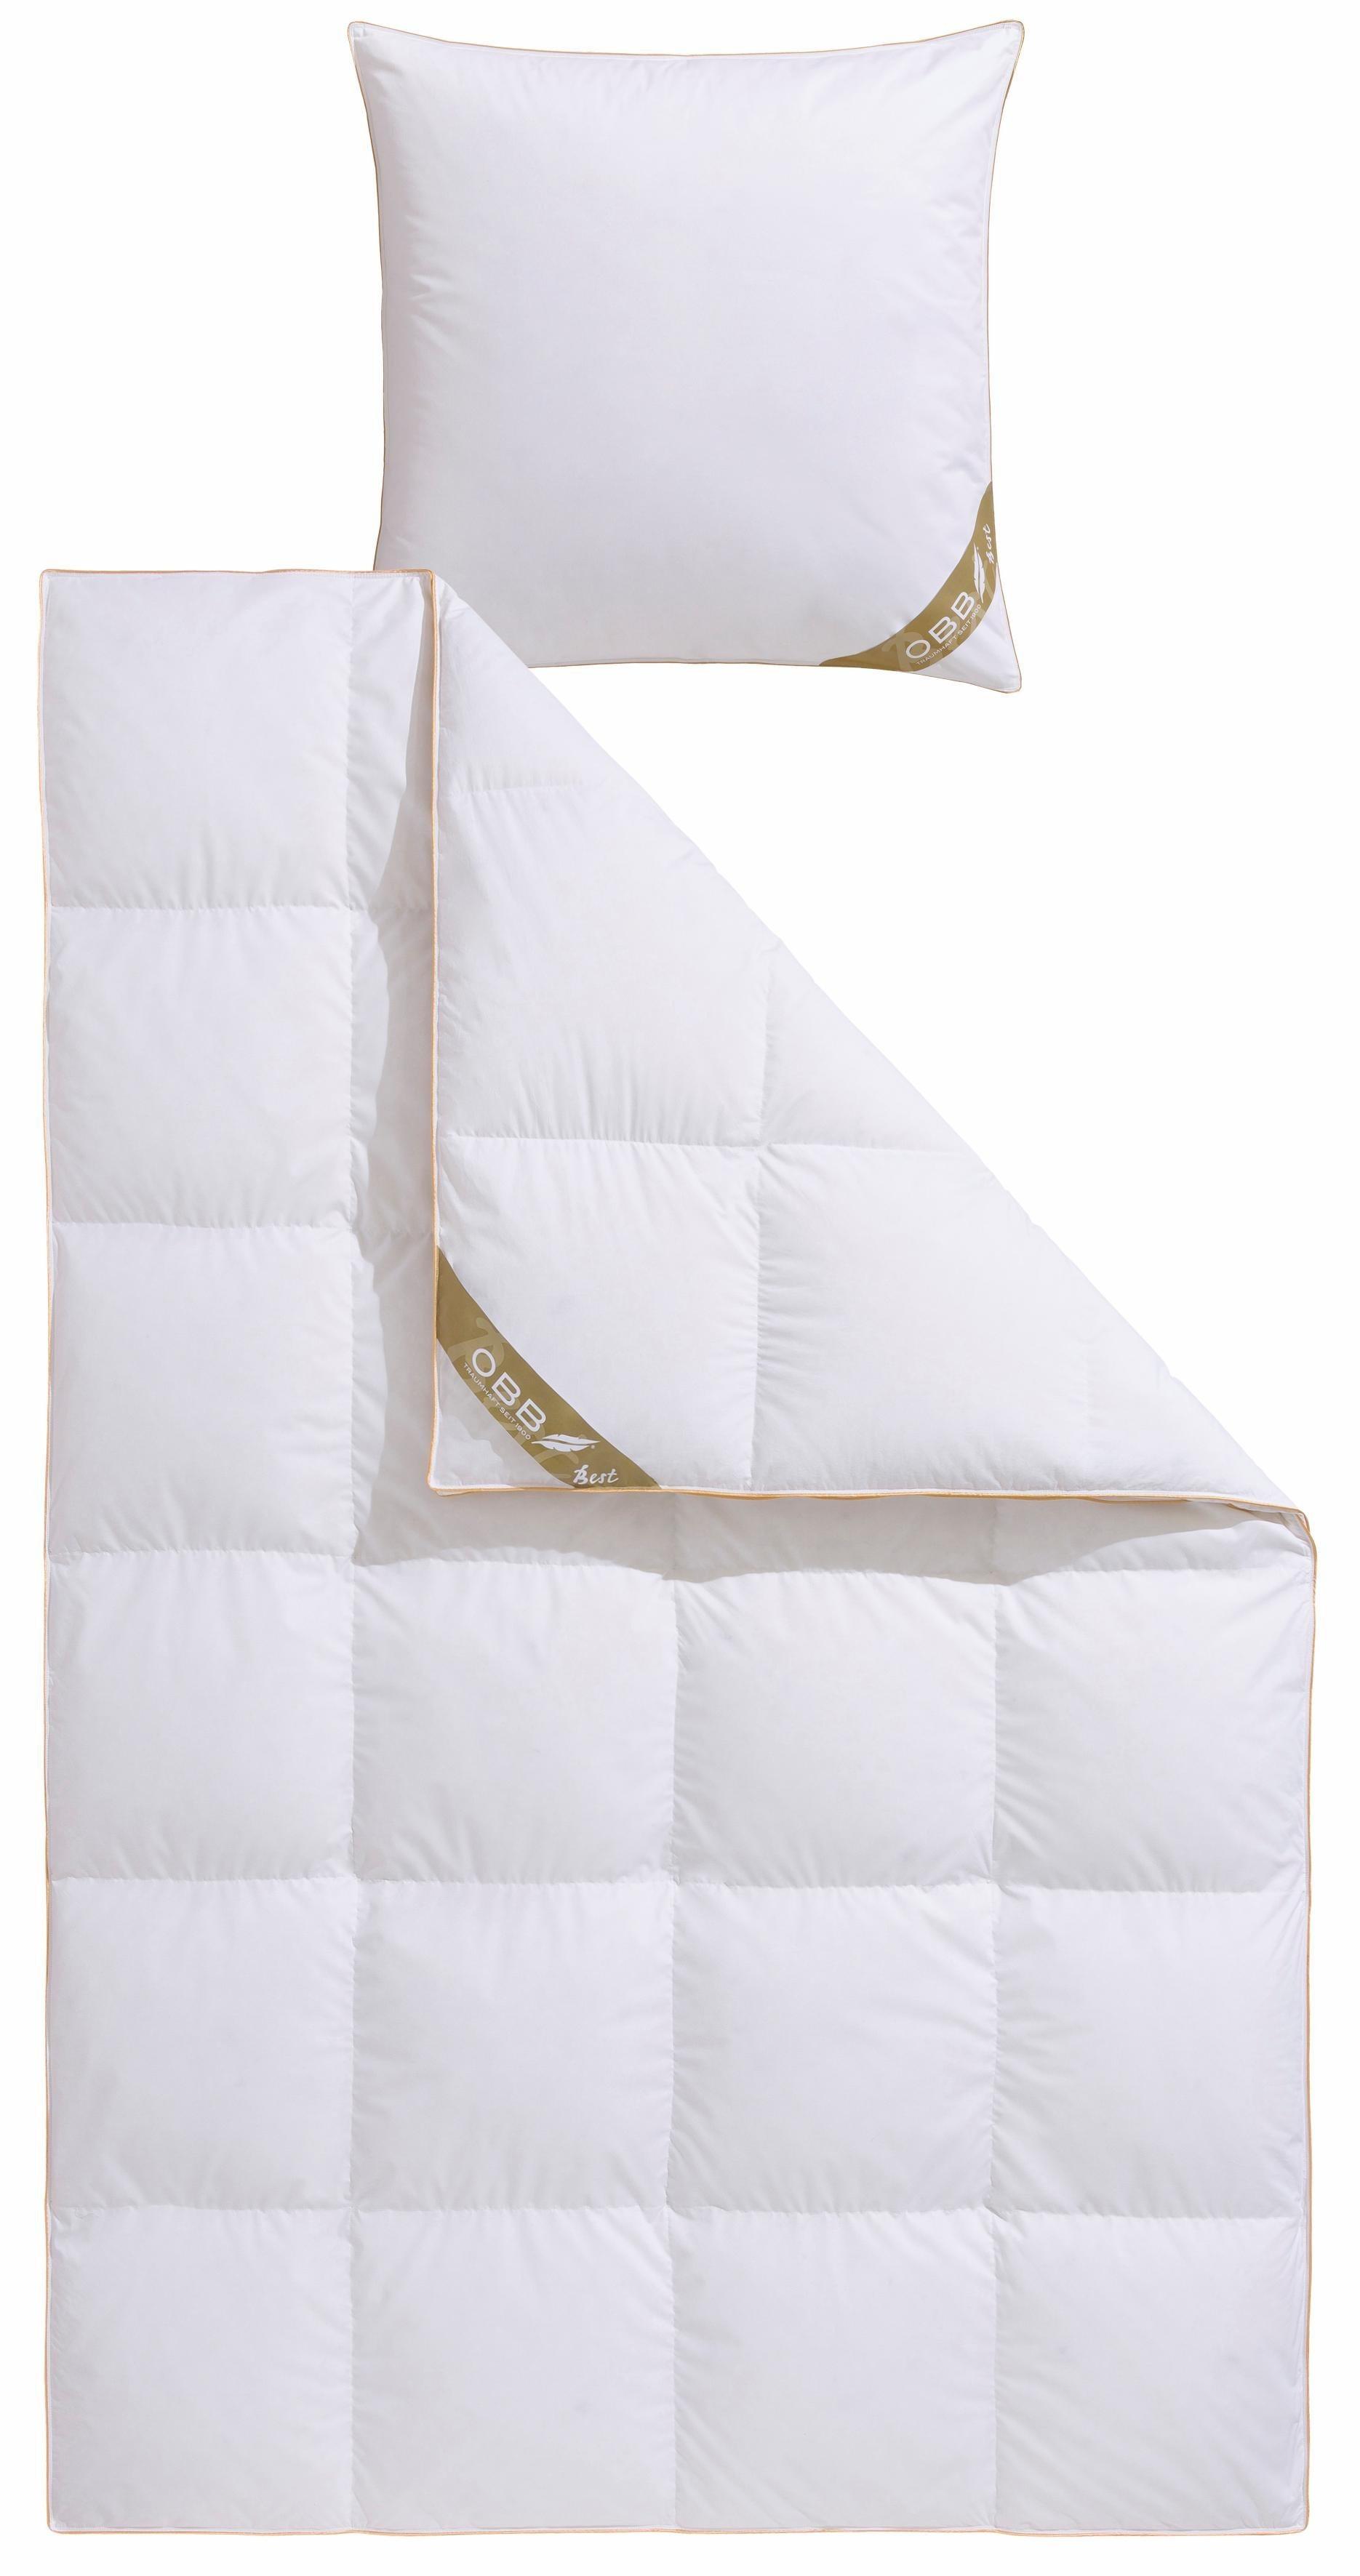 Bettdeckenset, »Best«, OBB, Extrawarm, 90% Daunen, 10% Federn | Heimtextilien > Decken und Kissen > Bettdecken | Federn | OBB